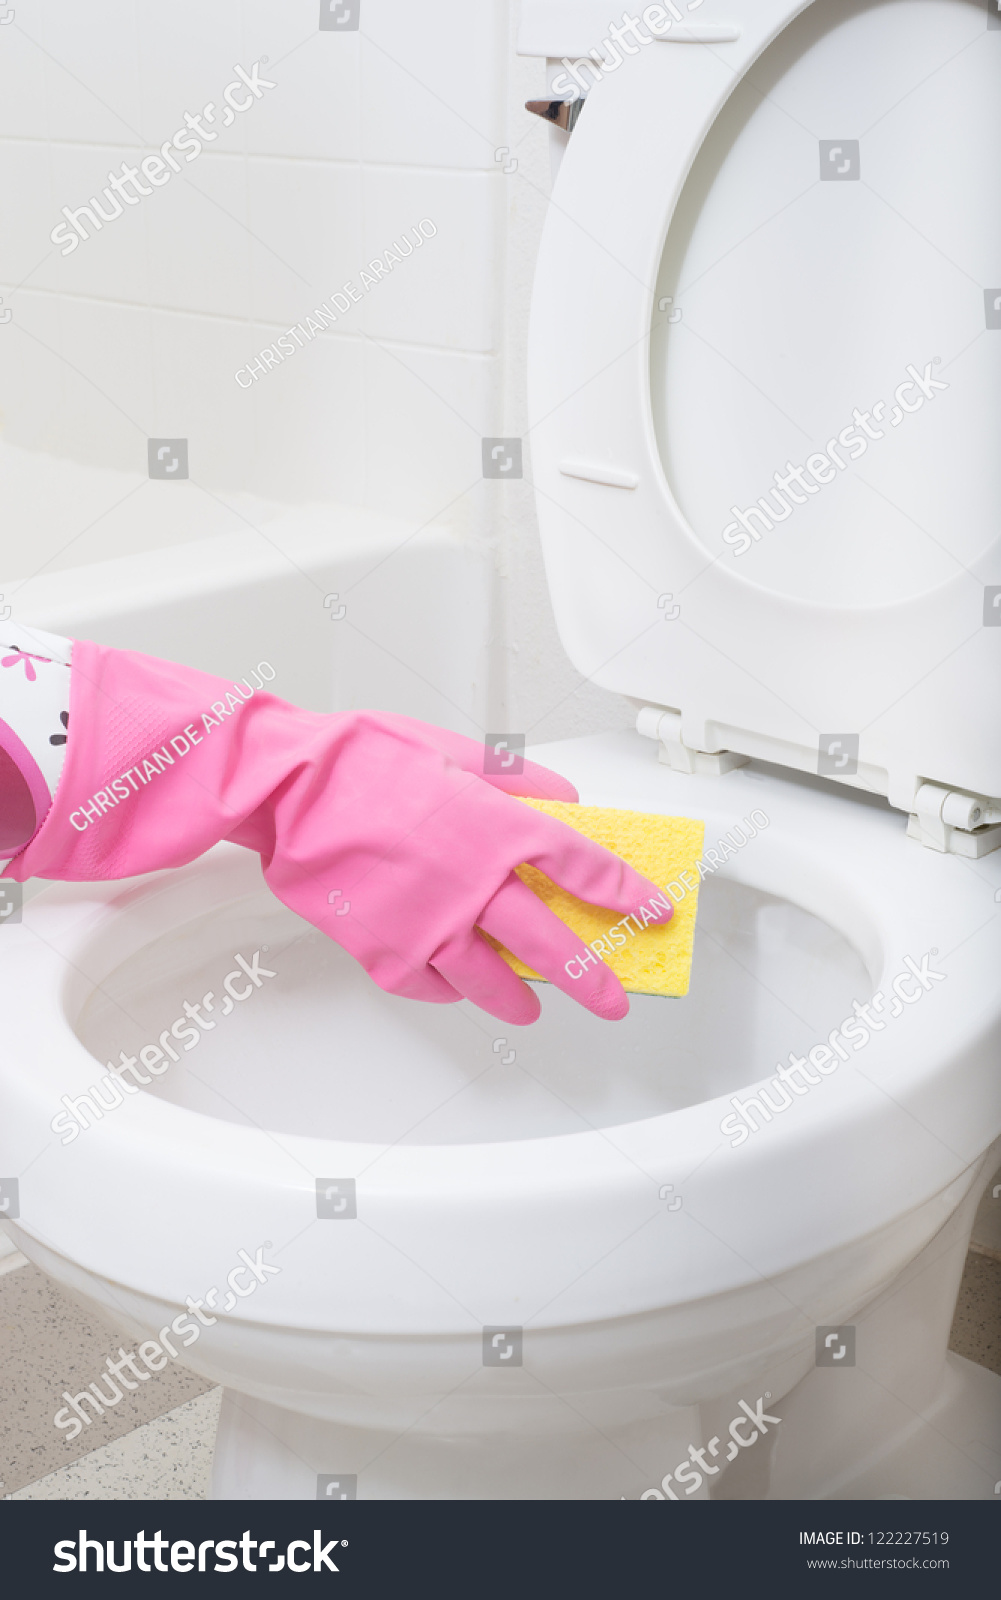 how to get toilet bowl white